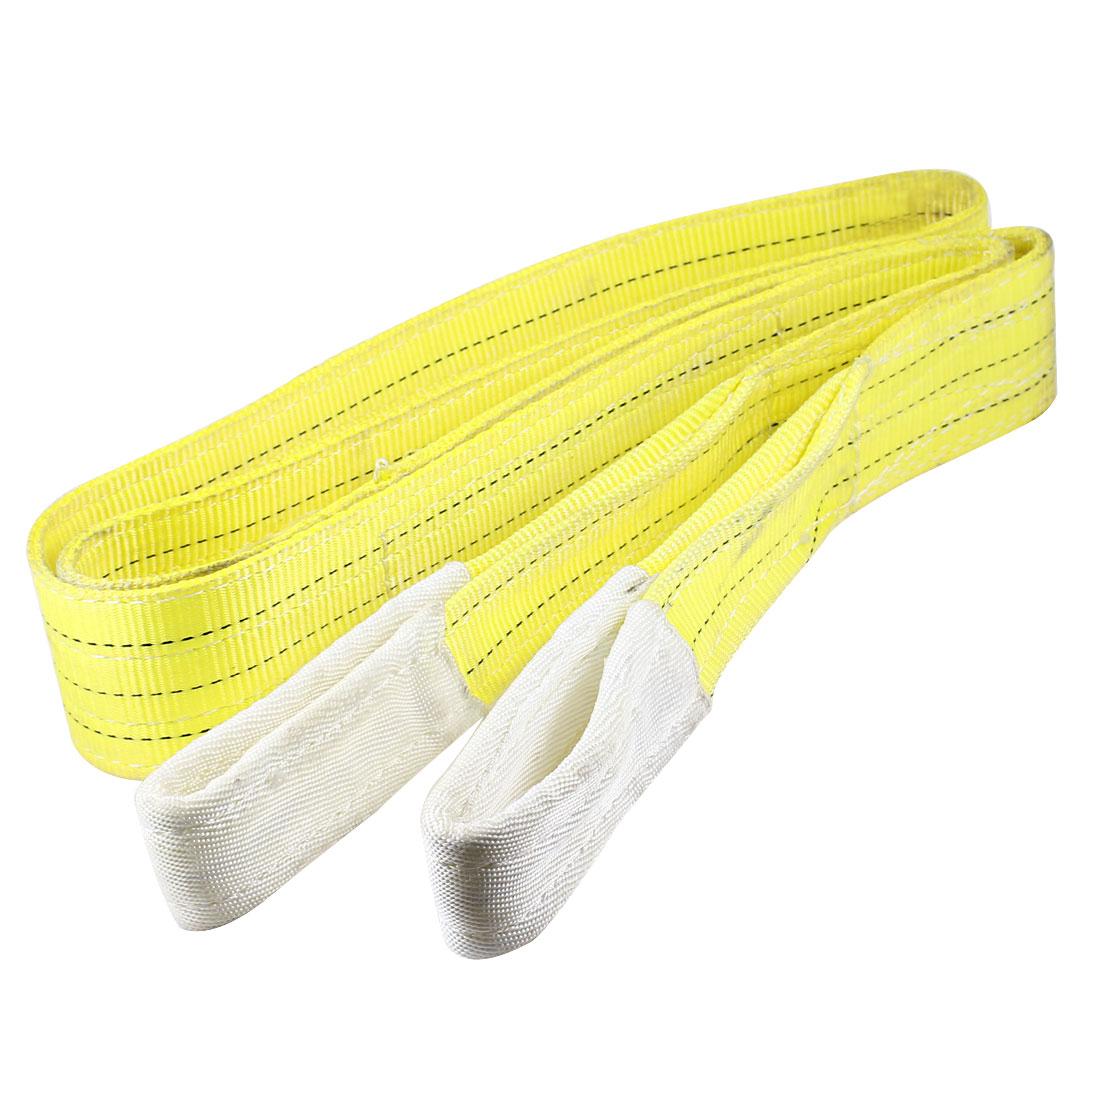 300cm Length 7.5cm Width 3 Ton Yellow Polyster Webbing Lifting Tow Strap